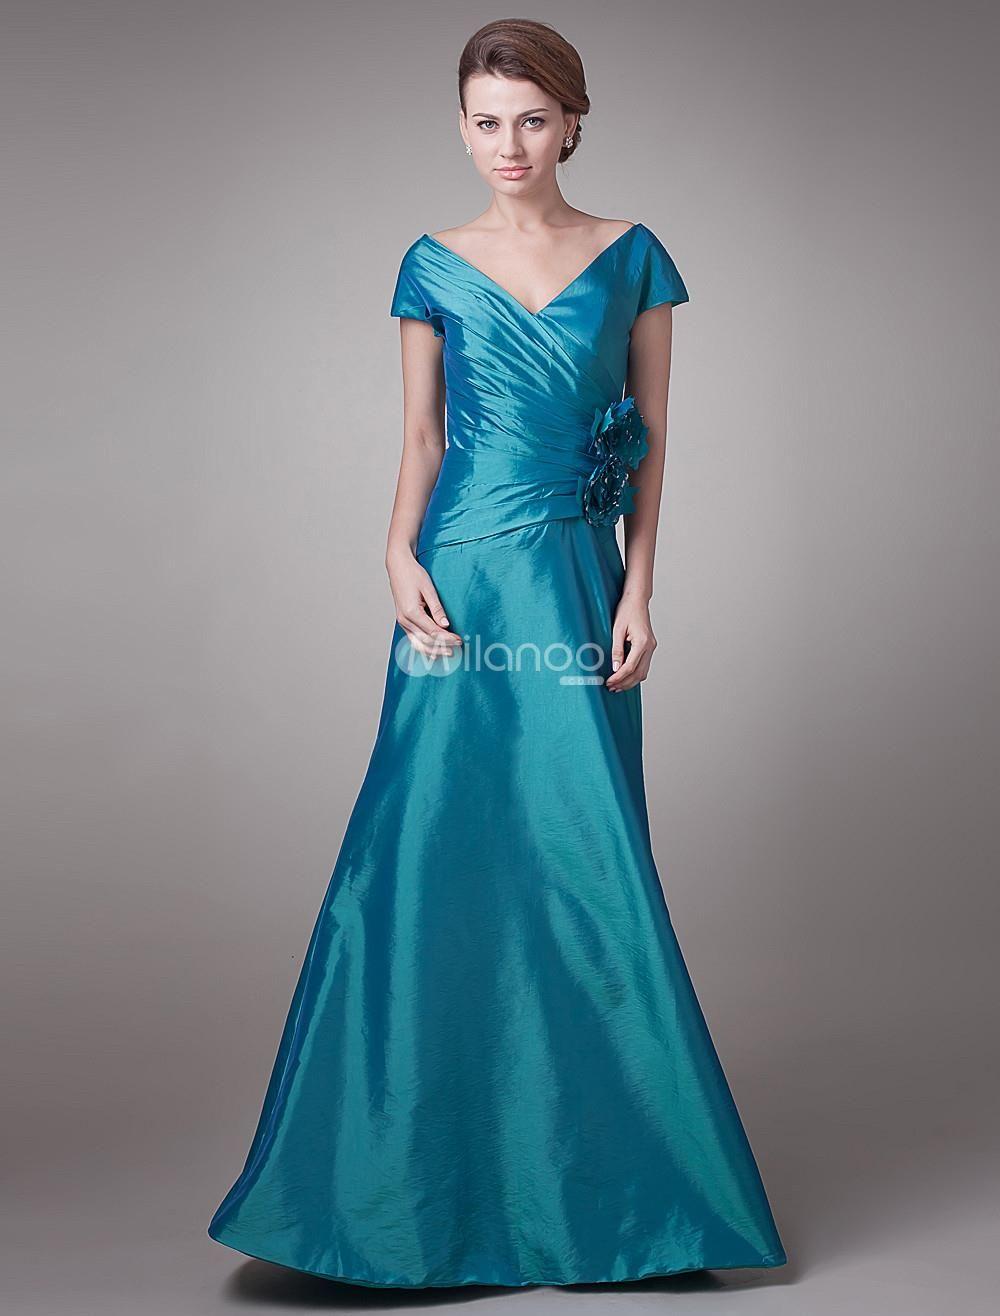 Elegant army green taffeta vneck applique mother of the bride dress